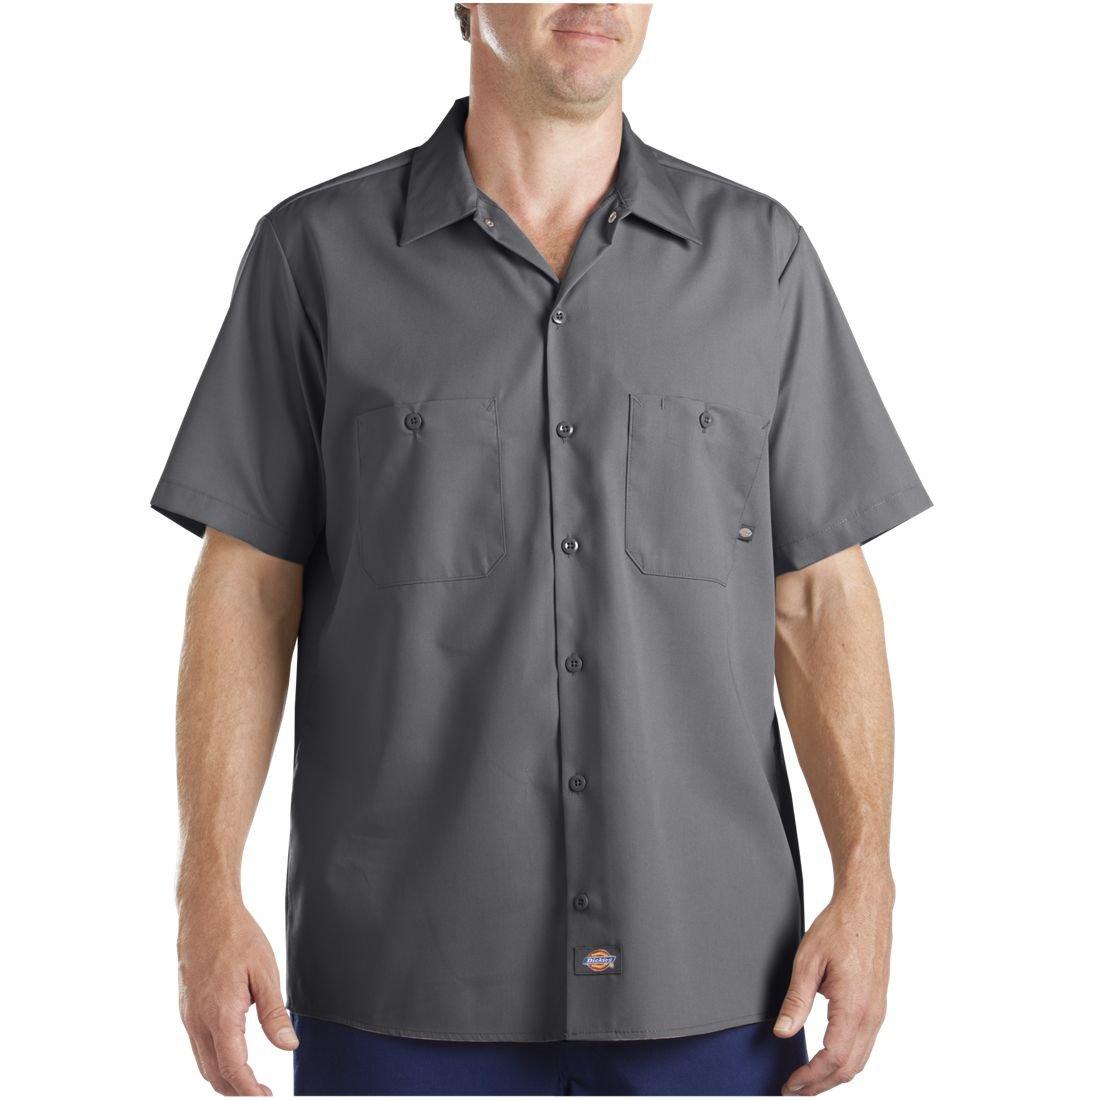 Amazon Ford Classic Logo Symbol Mechanics Work Shirt Clothing